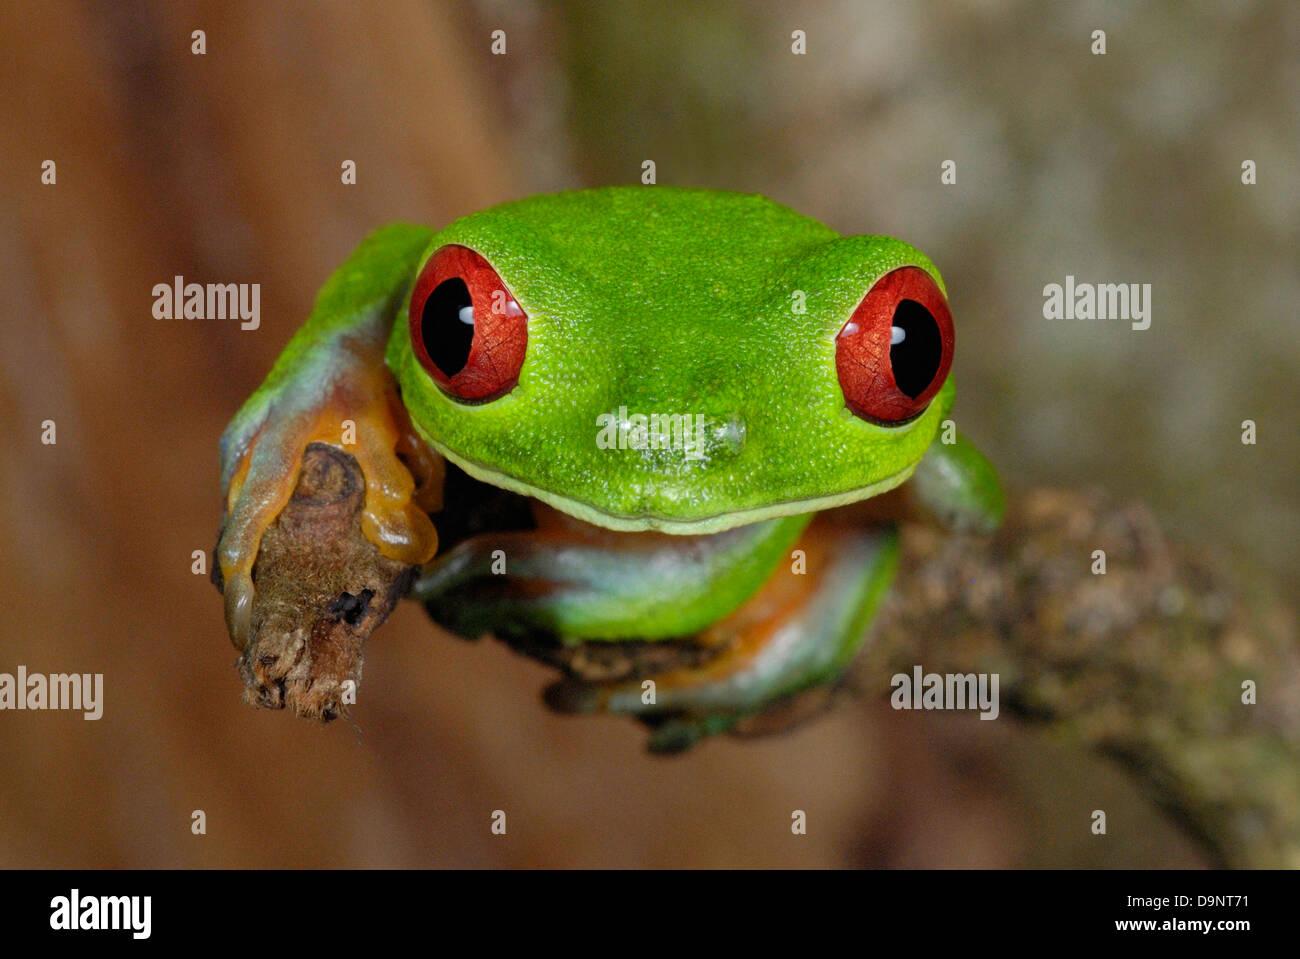 Red-eyed Treefrog (Agalychnis callidryas) in Costa Rica rainforest - Stock Image